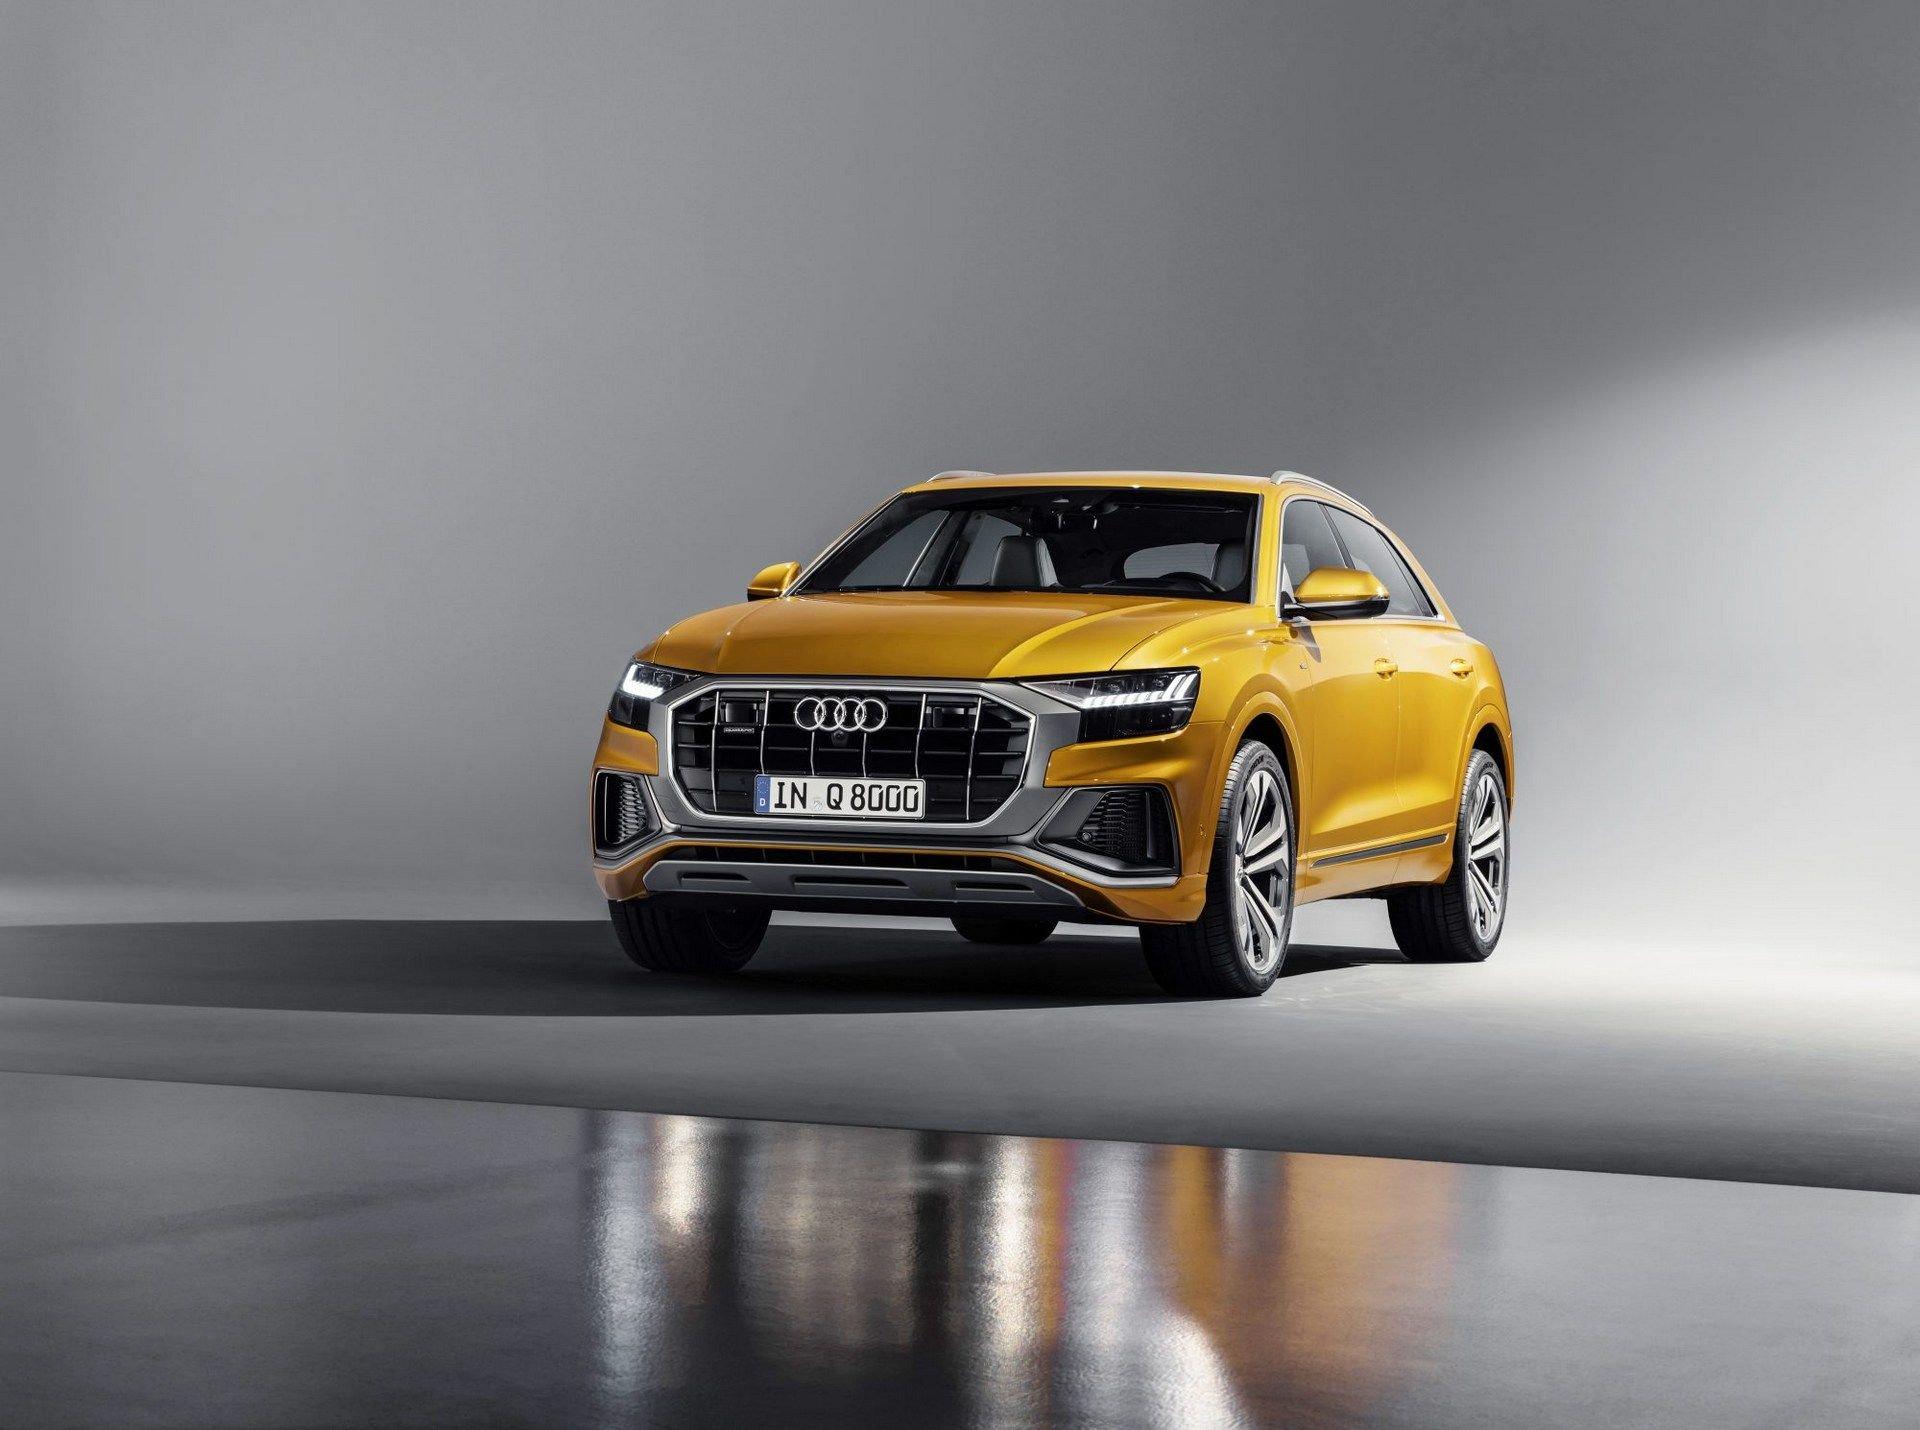 Audi Q8 2018 First Photos (8)